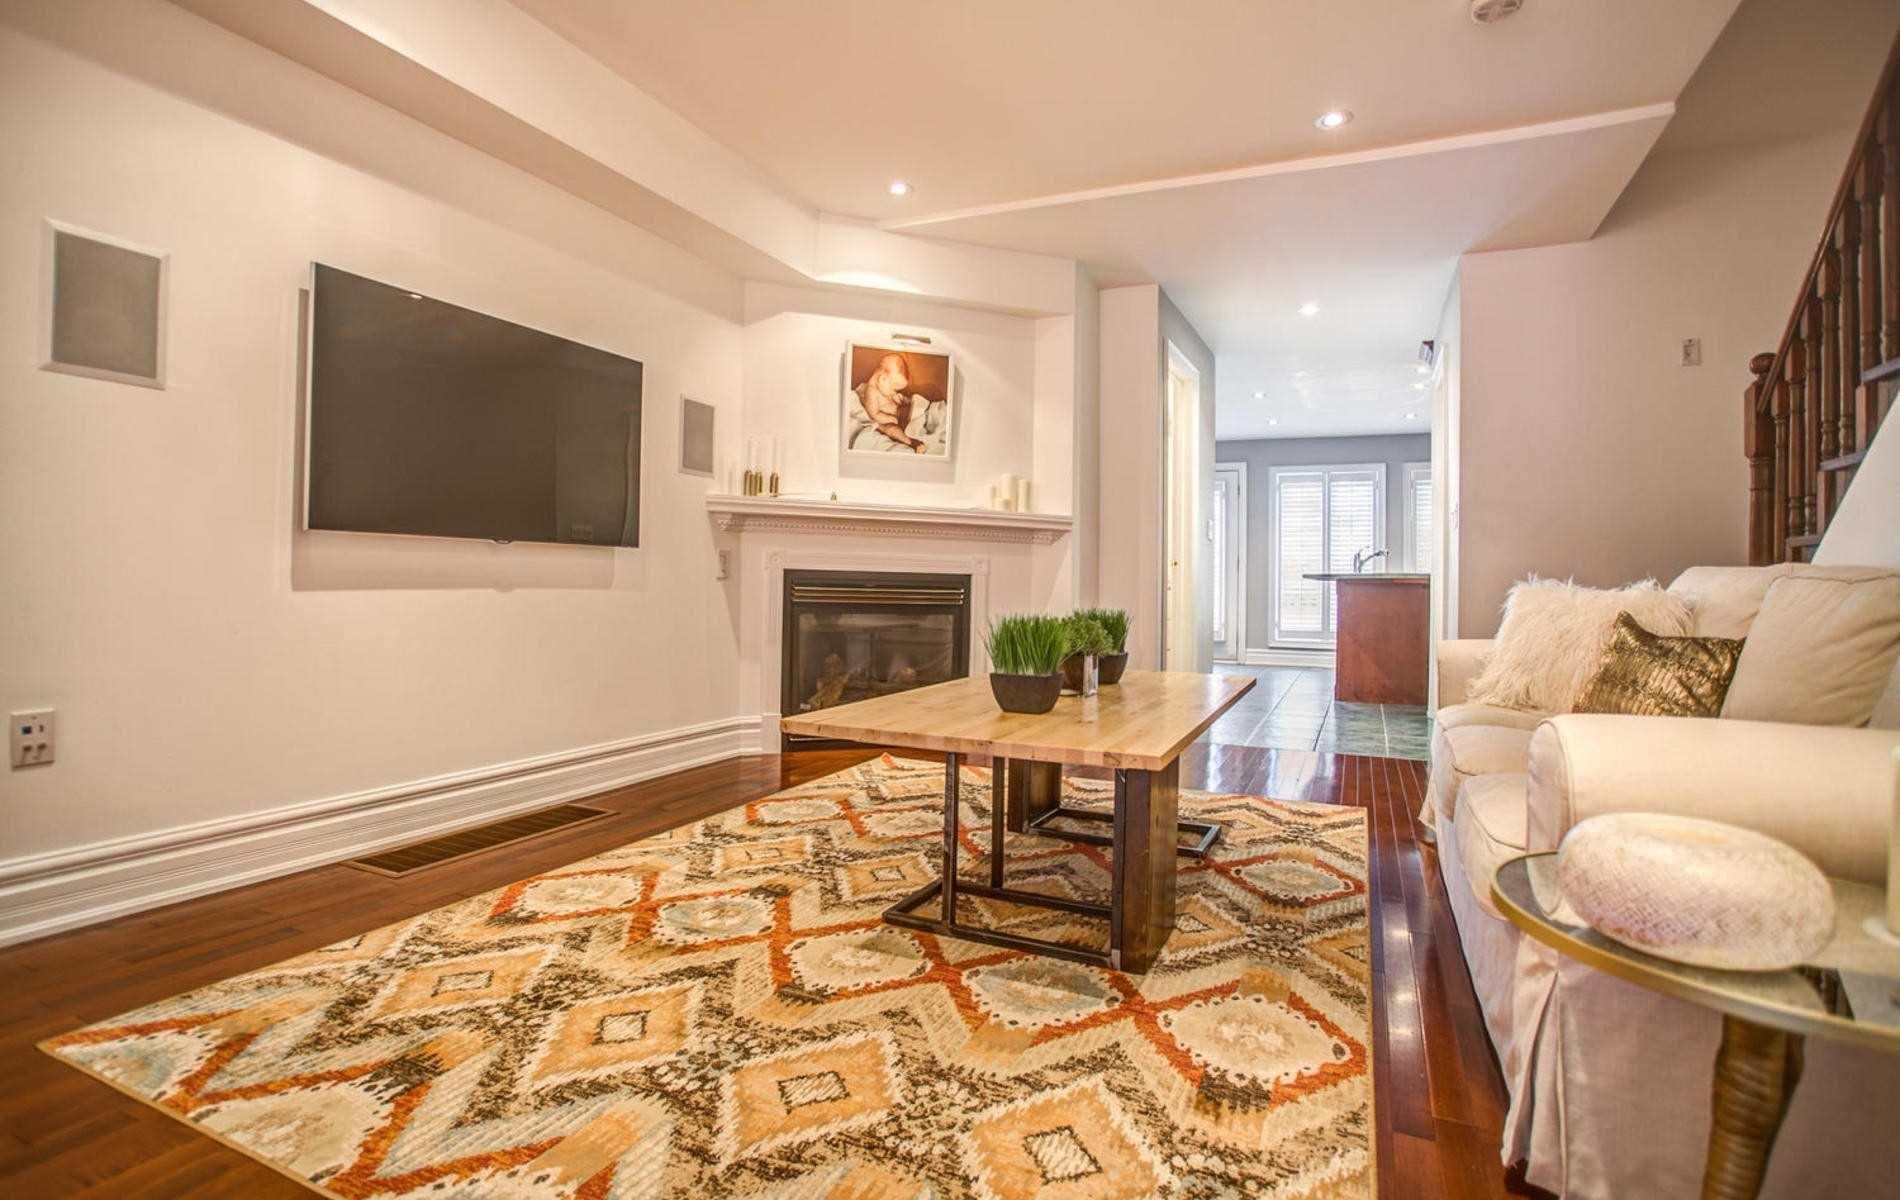 Photo 4: Photos: 119 Carlaw Avenue in Toronto: South Riverdale House (3-Storey) for lease (Toronto E01)  : MLS®# E4386176